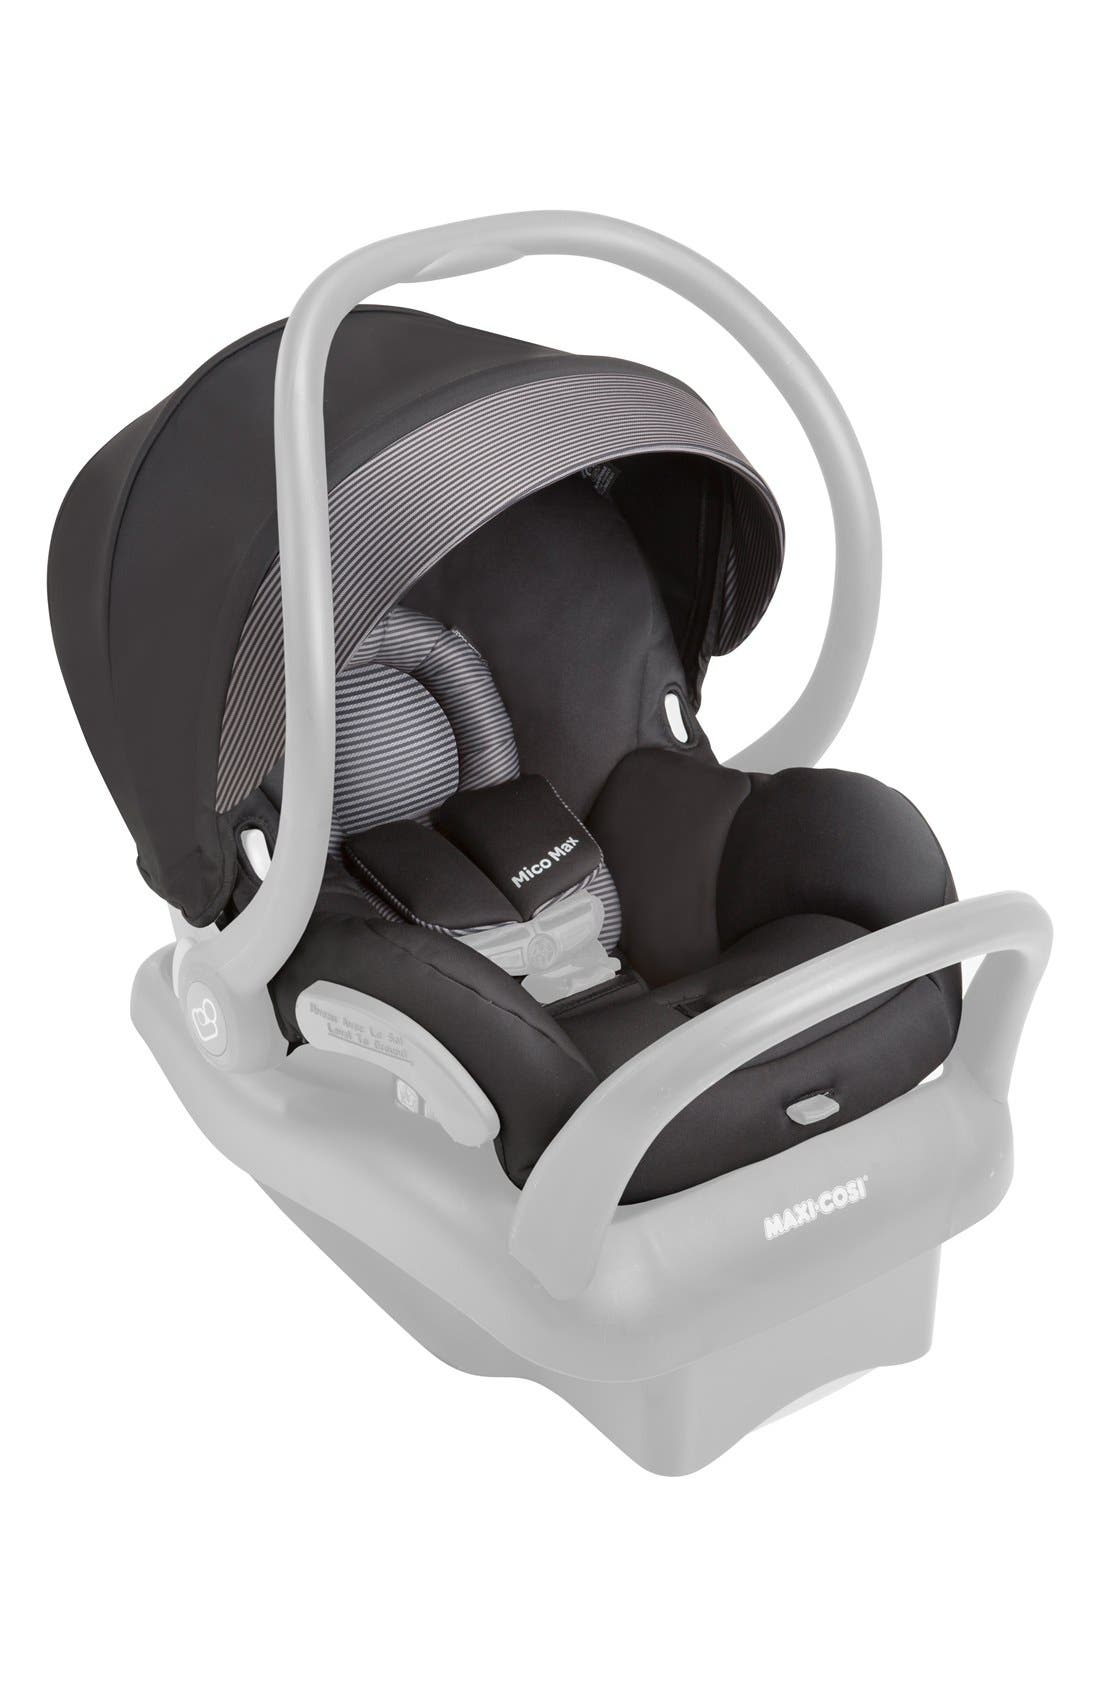 Maxi-Cosi® Seat Pad Fashion Kit for Mico Max 30 Car Seat